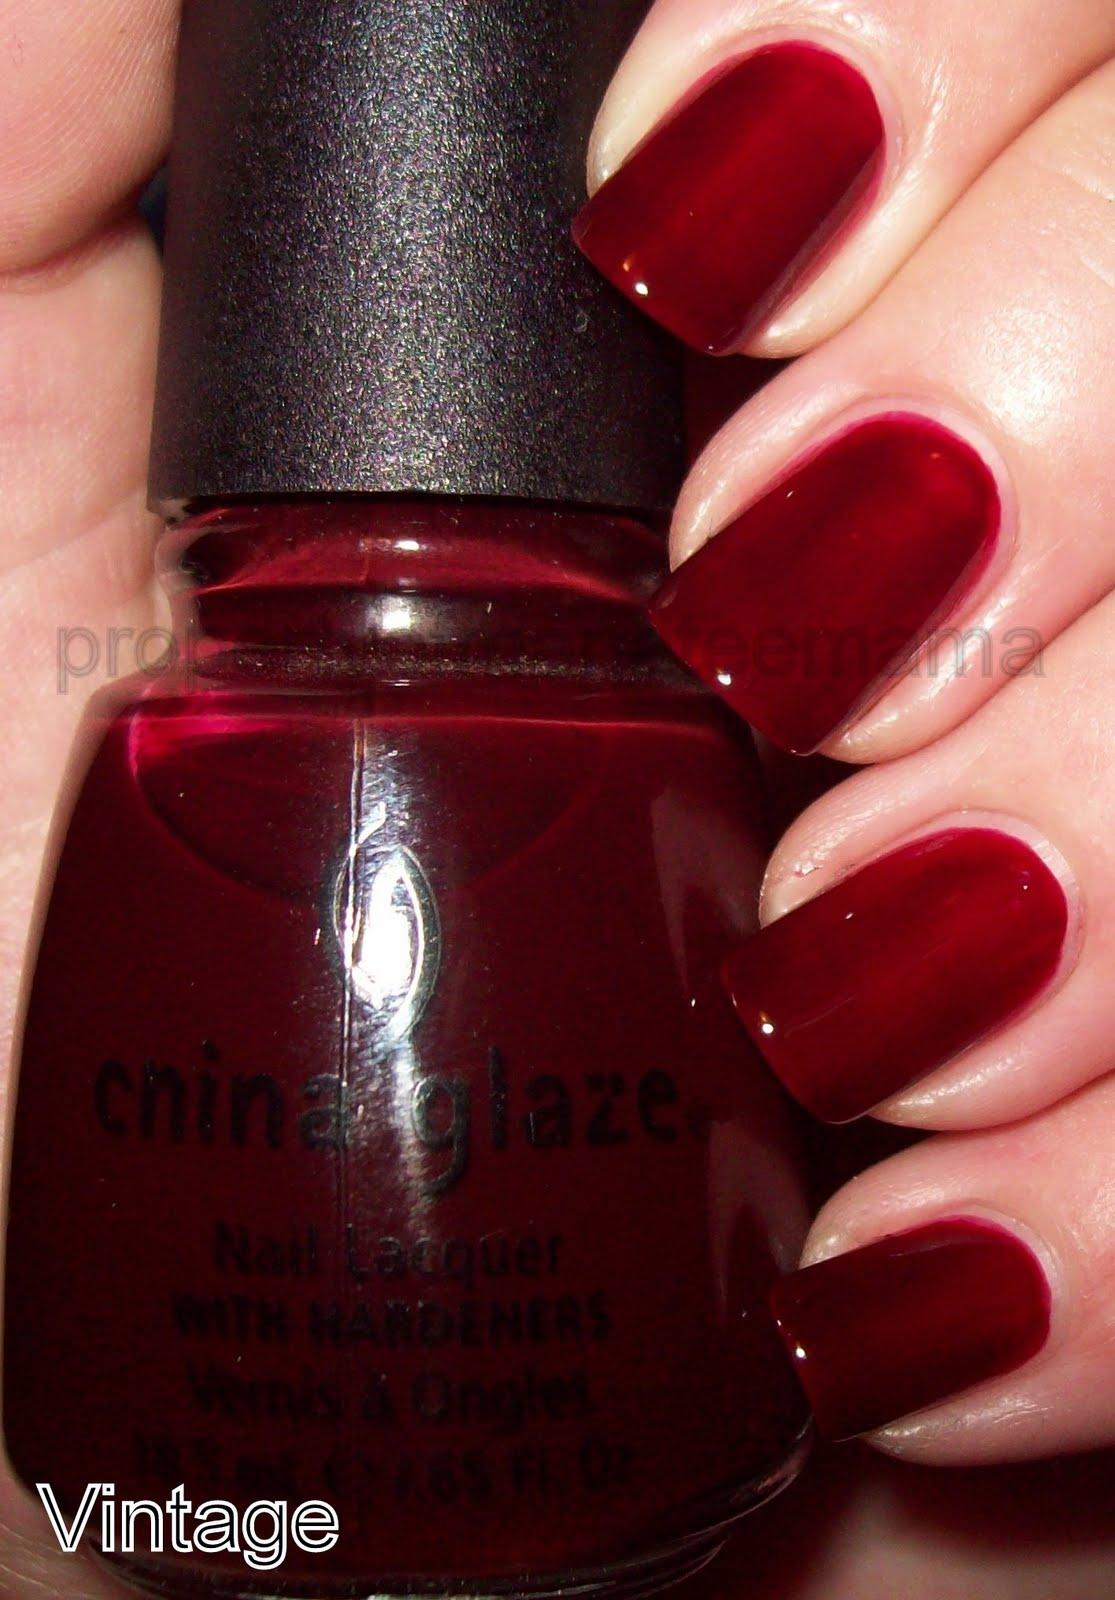 China Glaze Presenta Crakle Glaze: The Manicured Manatee: Some China Glaze Love